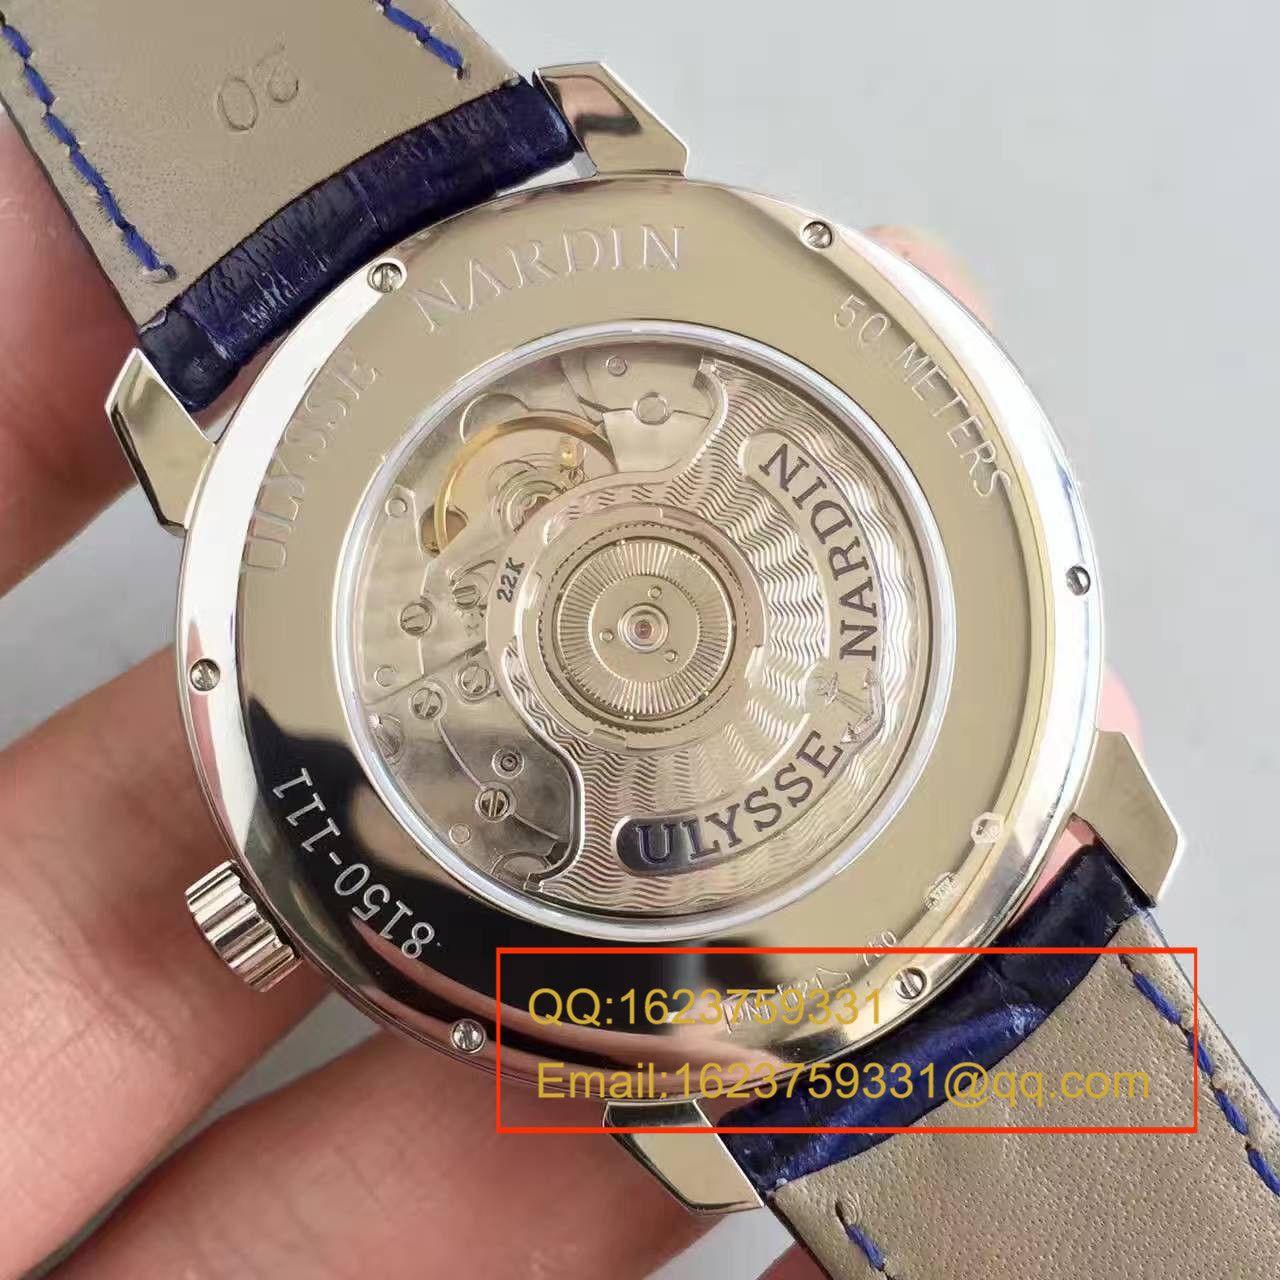 【FK厂1:1复刻手表】雅典鎏金系列8153-111-2/90腕表 / YD004